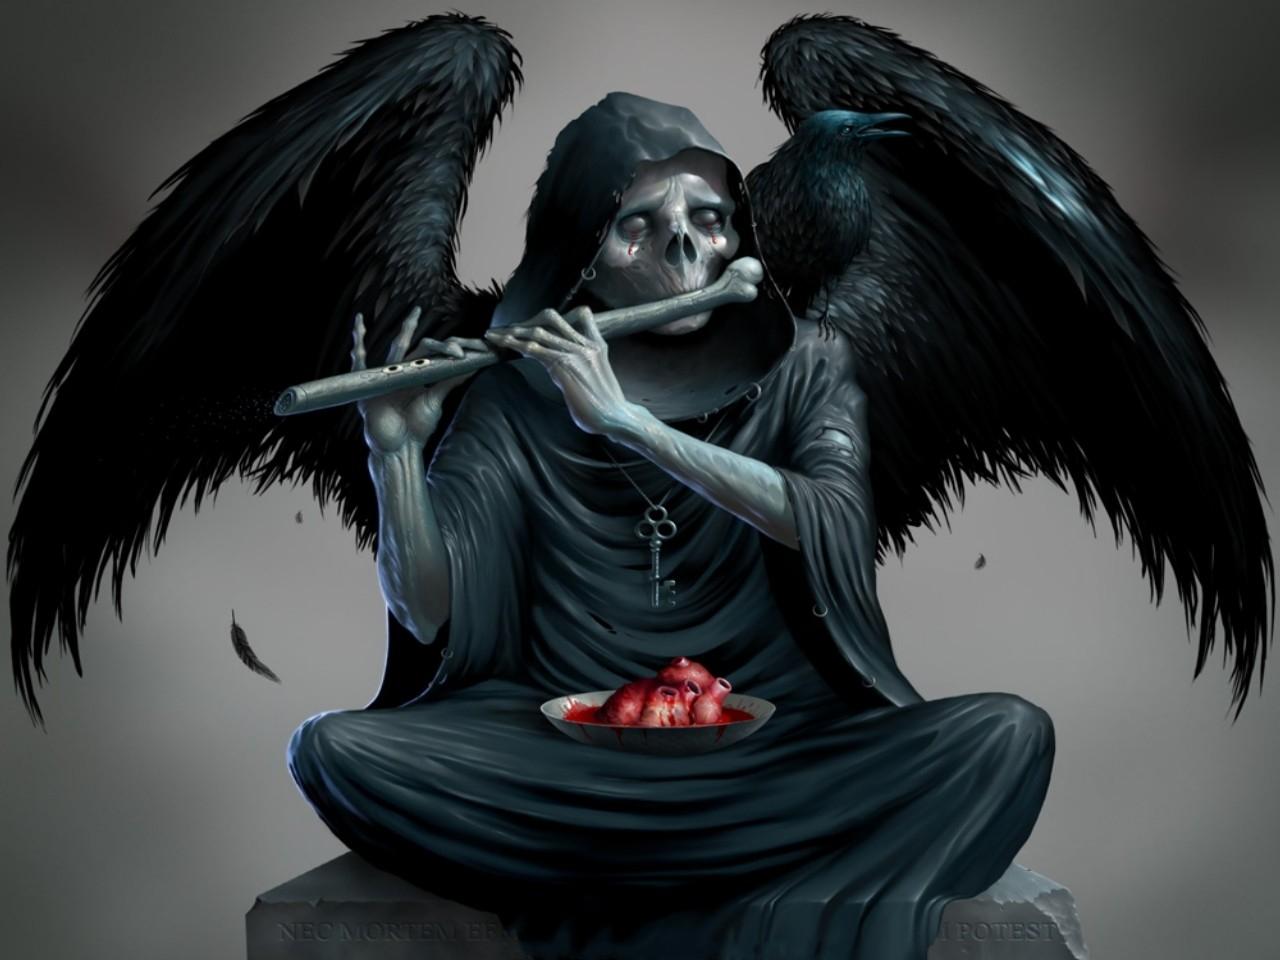 http://2.bp.blogspot.com/-jfXLnMNguoc/Ti--rALweiI/AAAAAAAADtQ/AdQFVWnvYJc/s1600/Dark-Angel-Wallpaper_horror.jpg